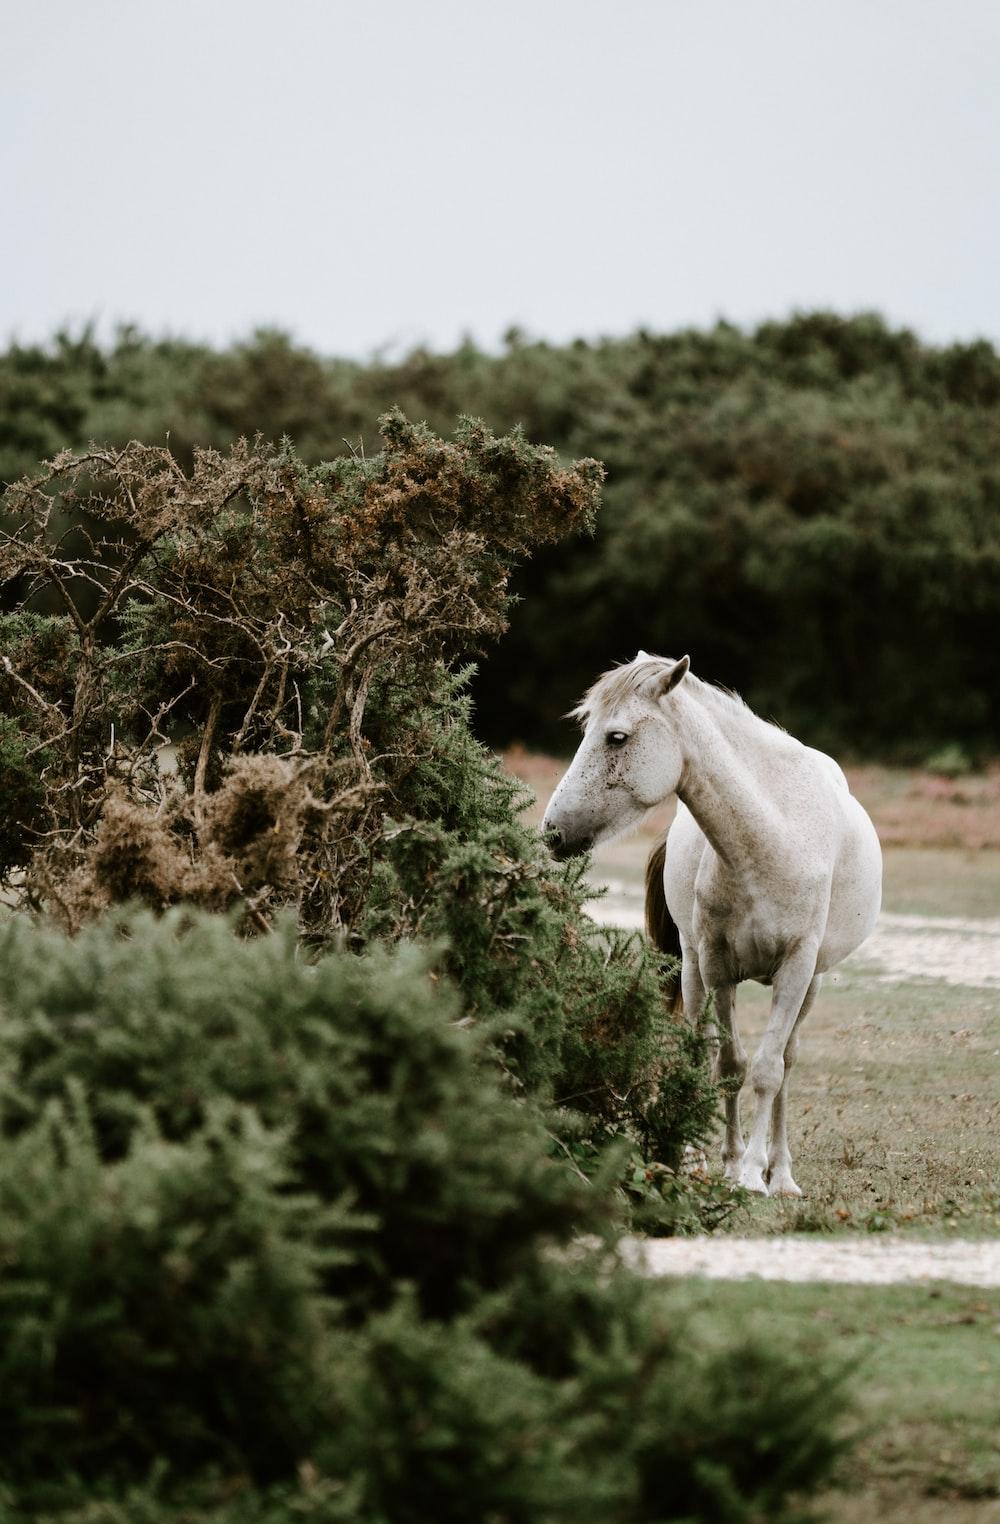 horse standing beside tree